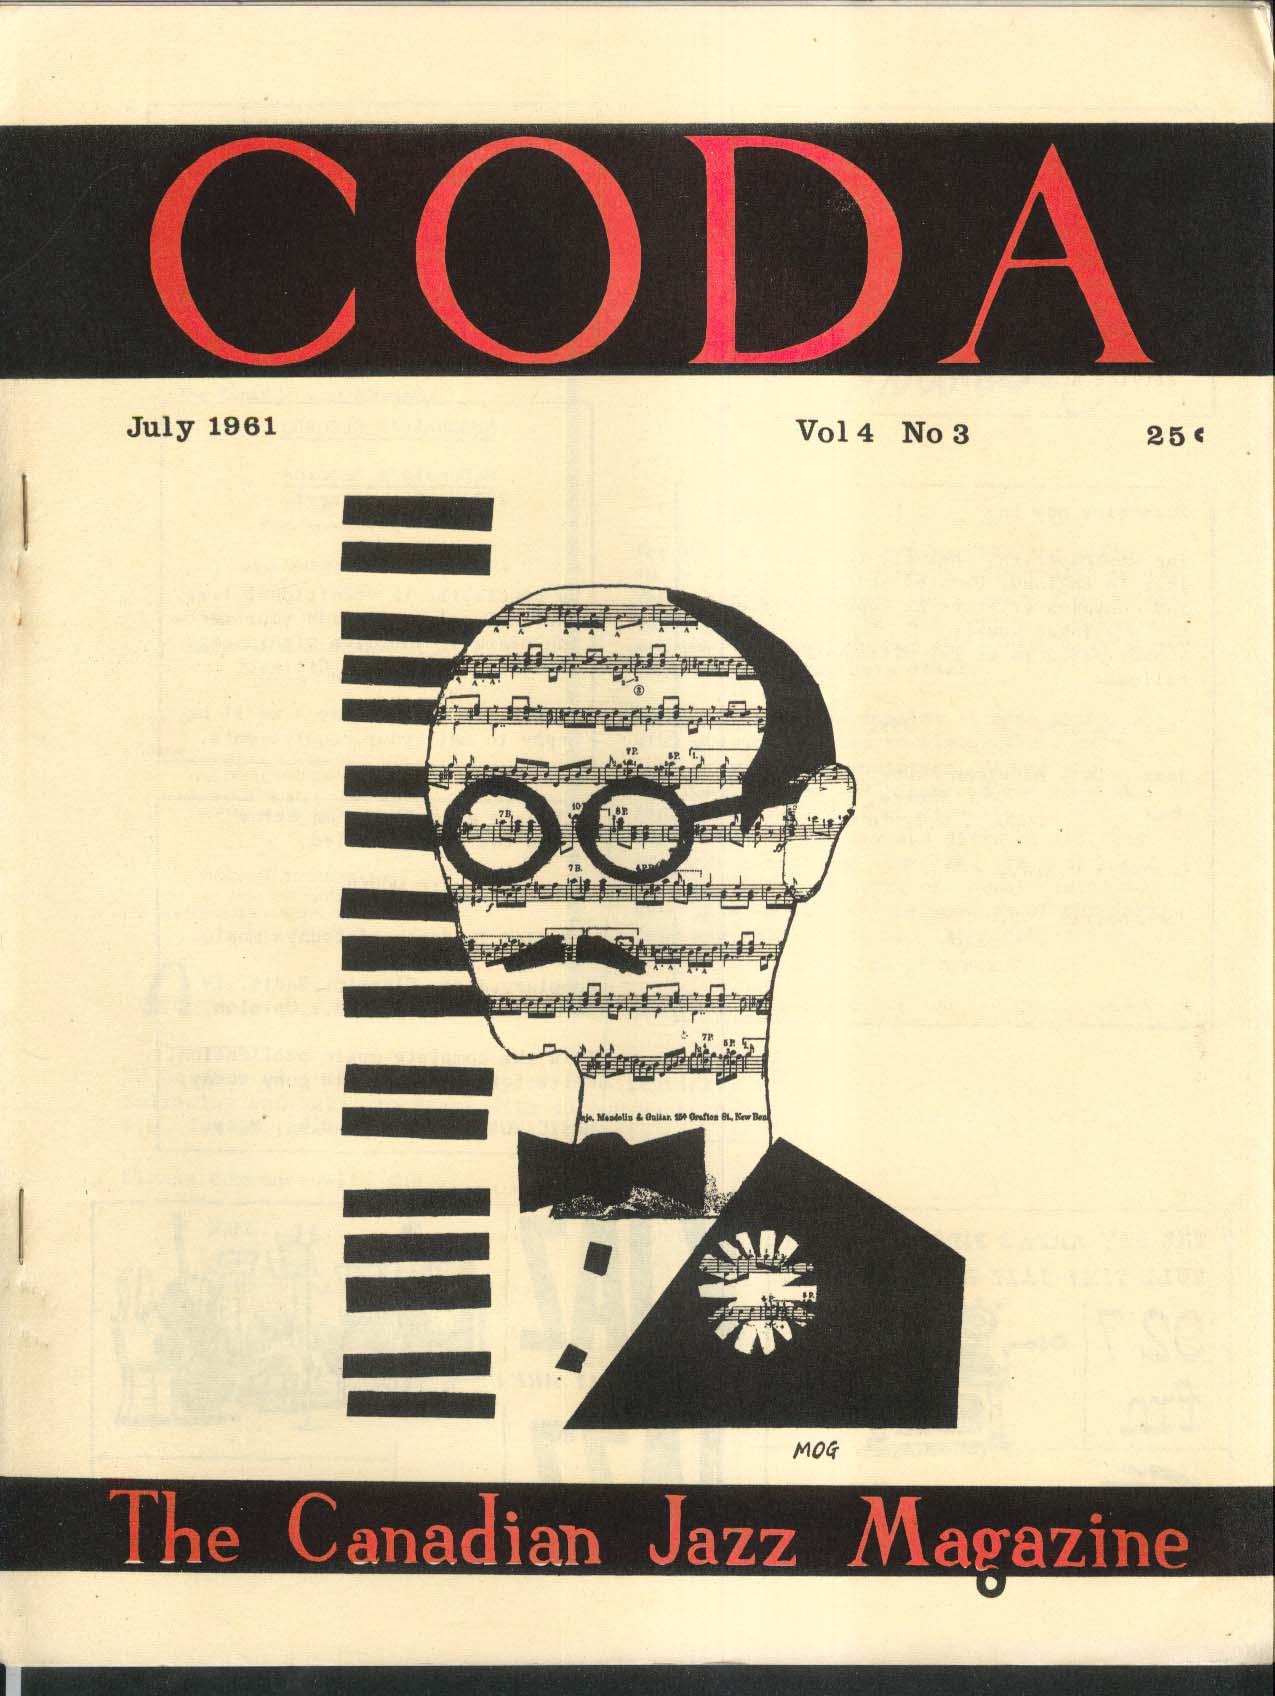 CODA V4 #3 Canadian Jazz Magazine Don Ewell Ron Collier Stan Kenton 7 1961